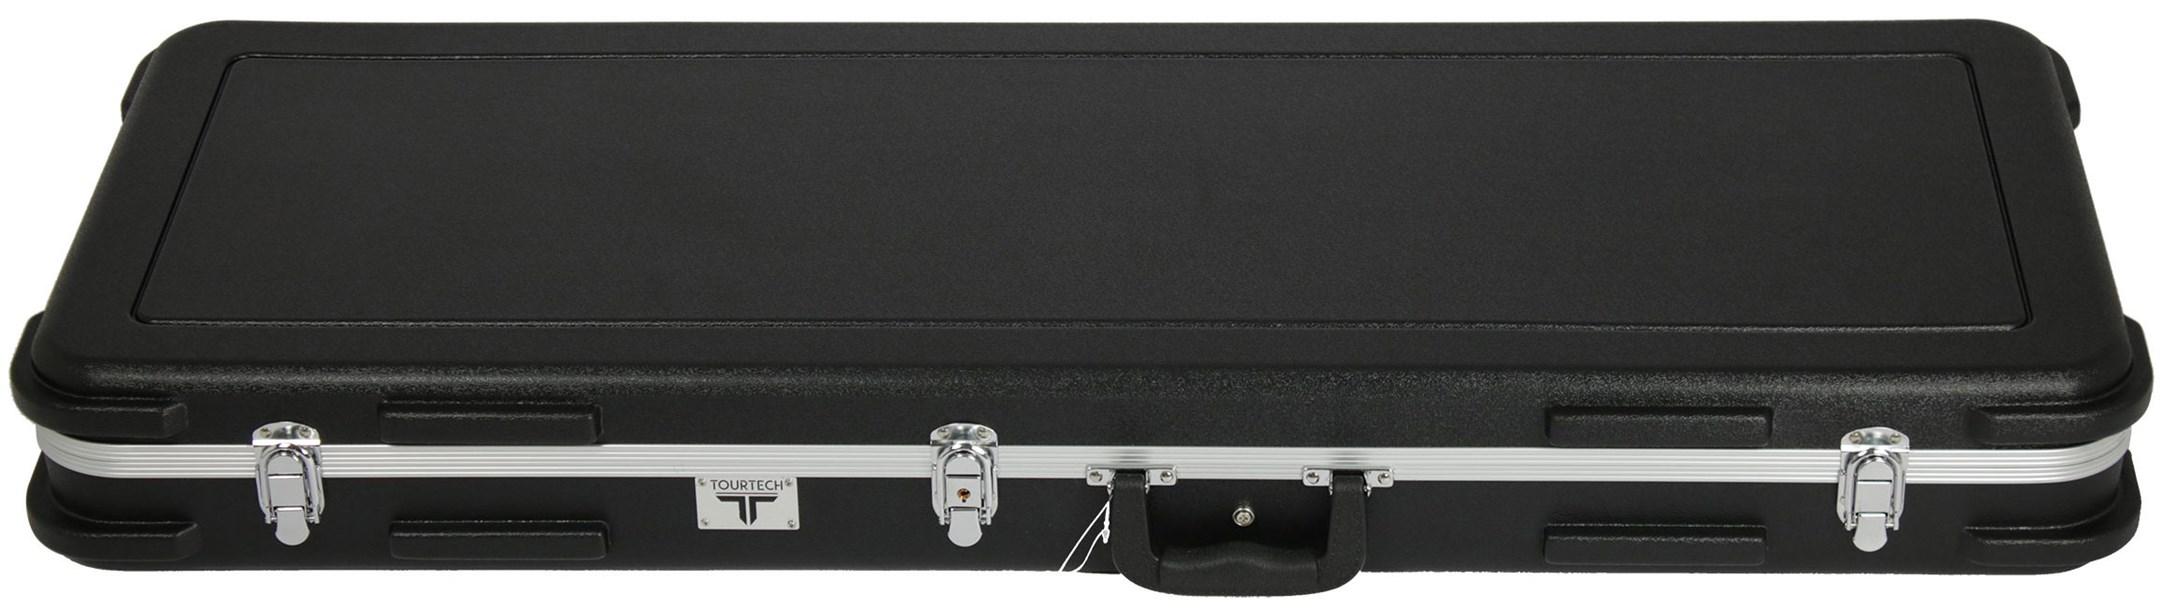 TOURTECH TTABS-EG Deluxe Electric Guitar ABS Hard Case